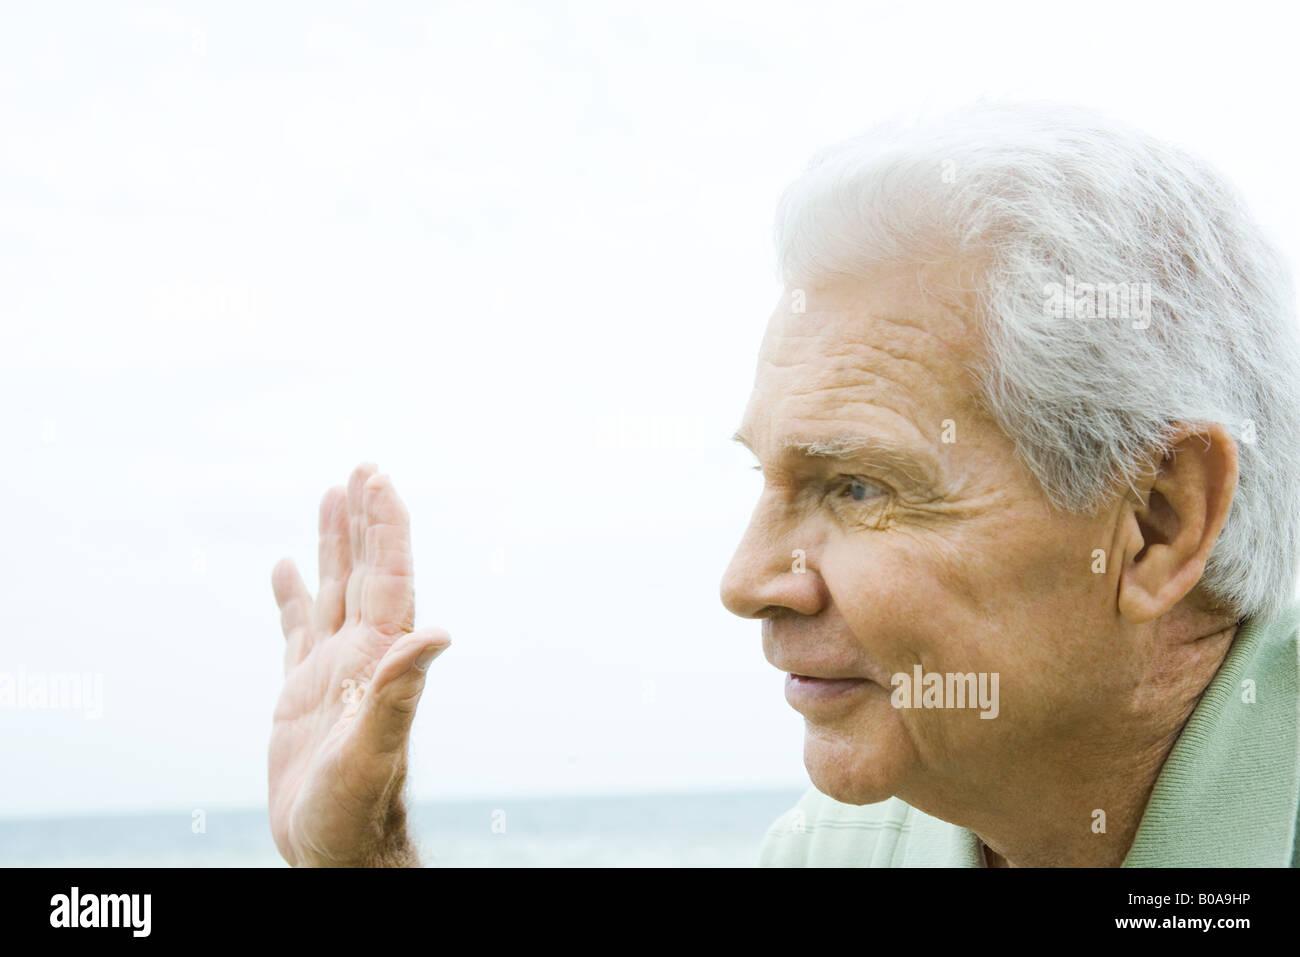 Senior man waving hand, smiling, side view - Stock Image